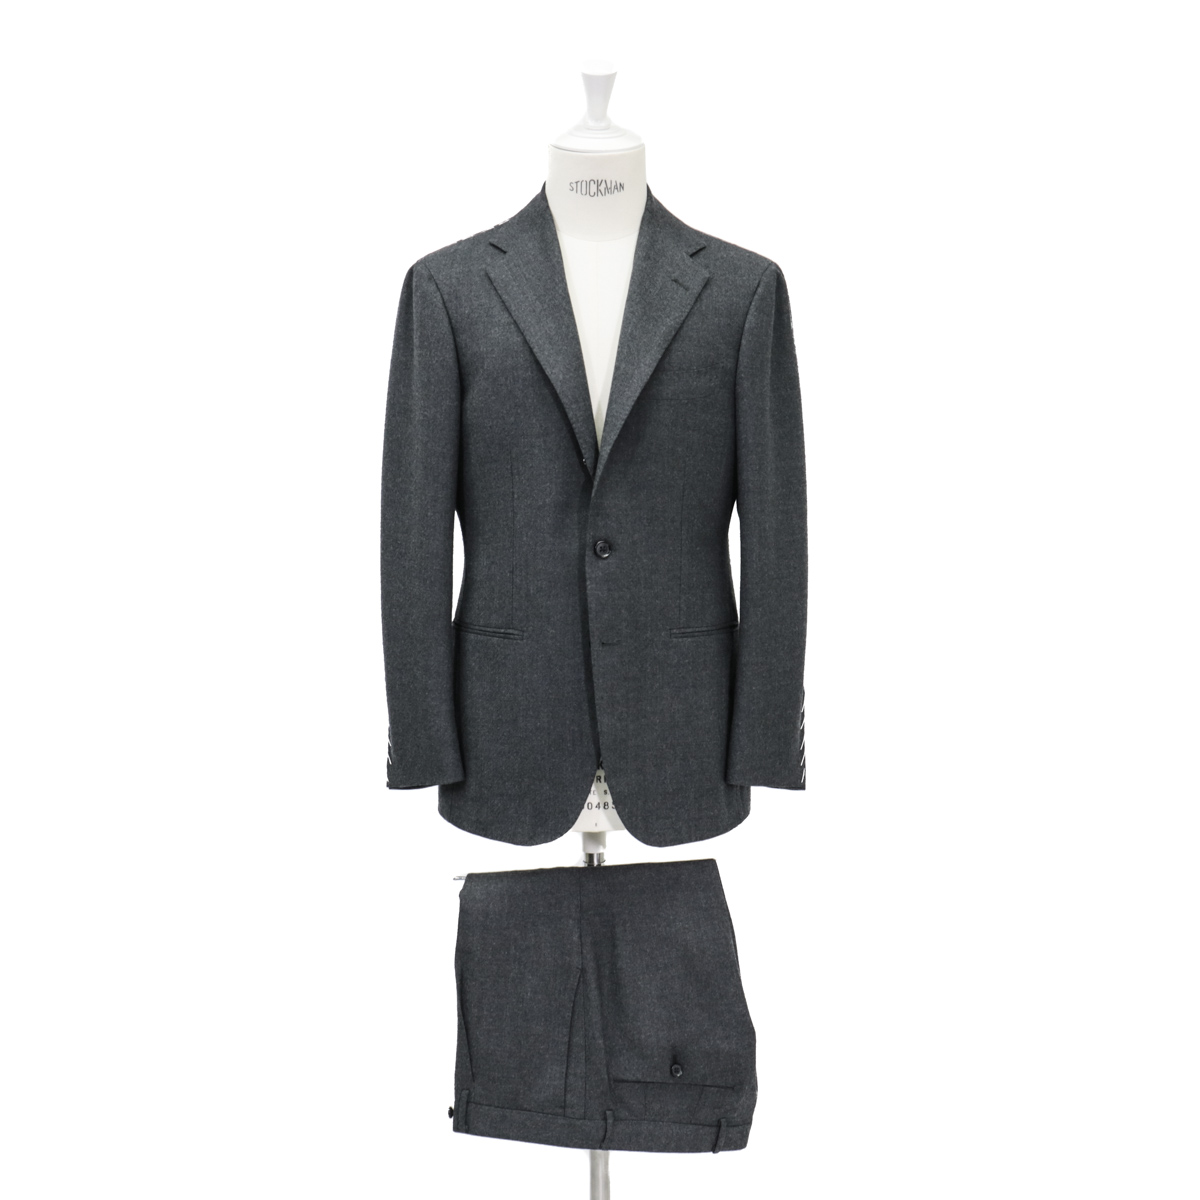 RING JACKET リングヂャケットModel No-253EH S-172HARTHUR HARRISON3Bスーツ【グレー】